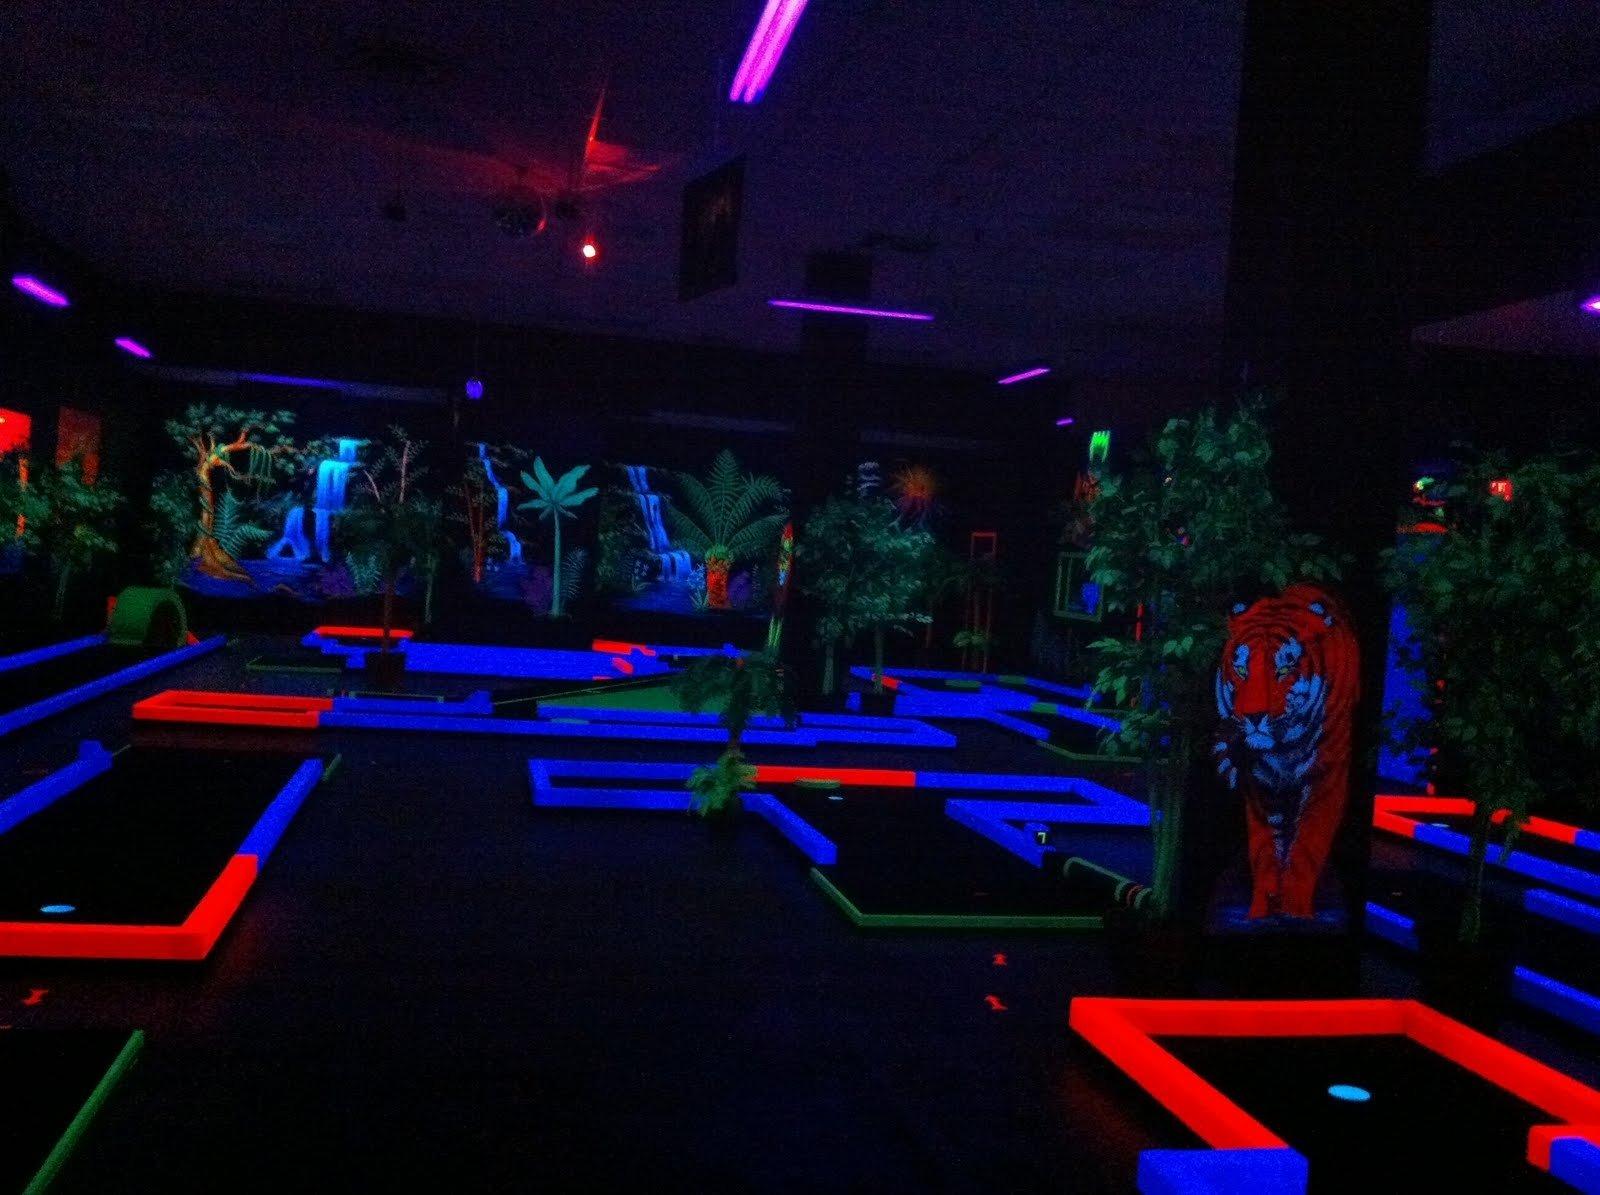 10 Stylish Glow In The Dark Room Ideas lovely glow in the dark room decor design idea and decors 2020